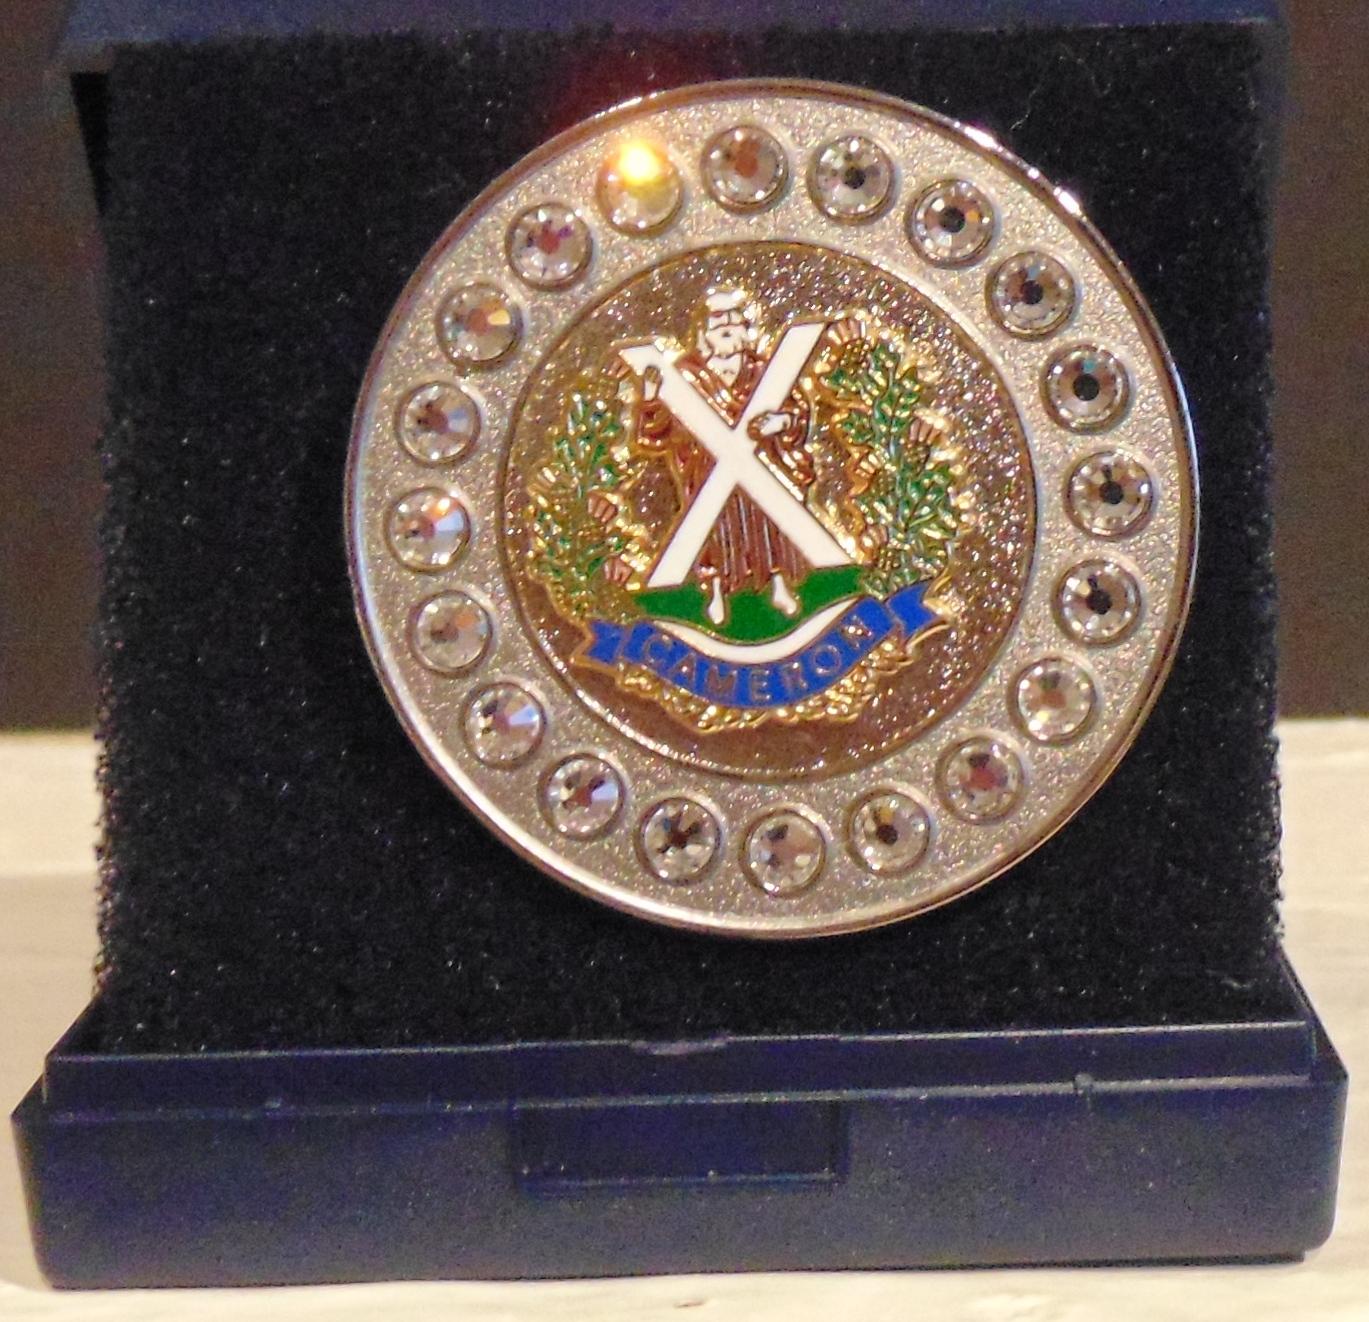 The Cameron Highlanders Regimental Brooch